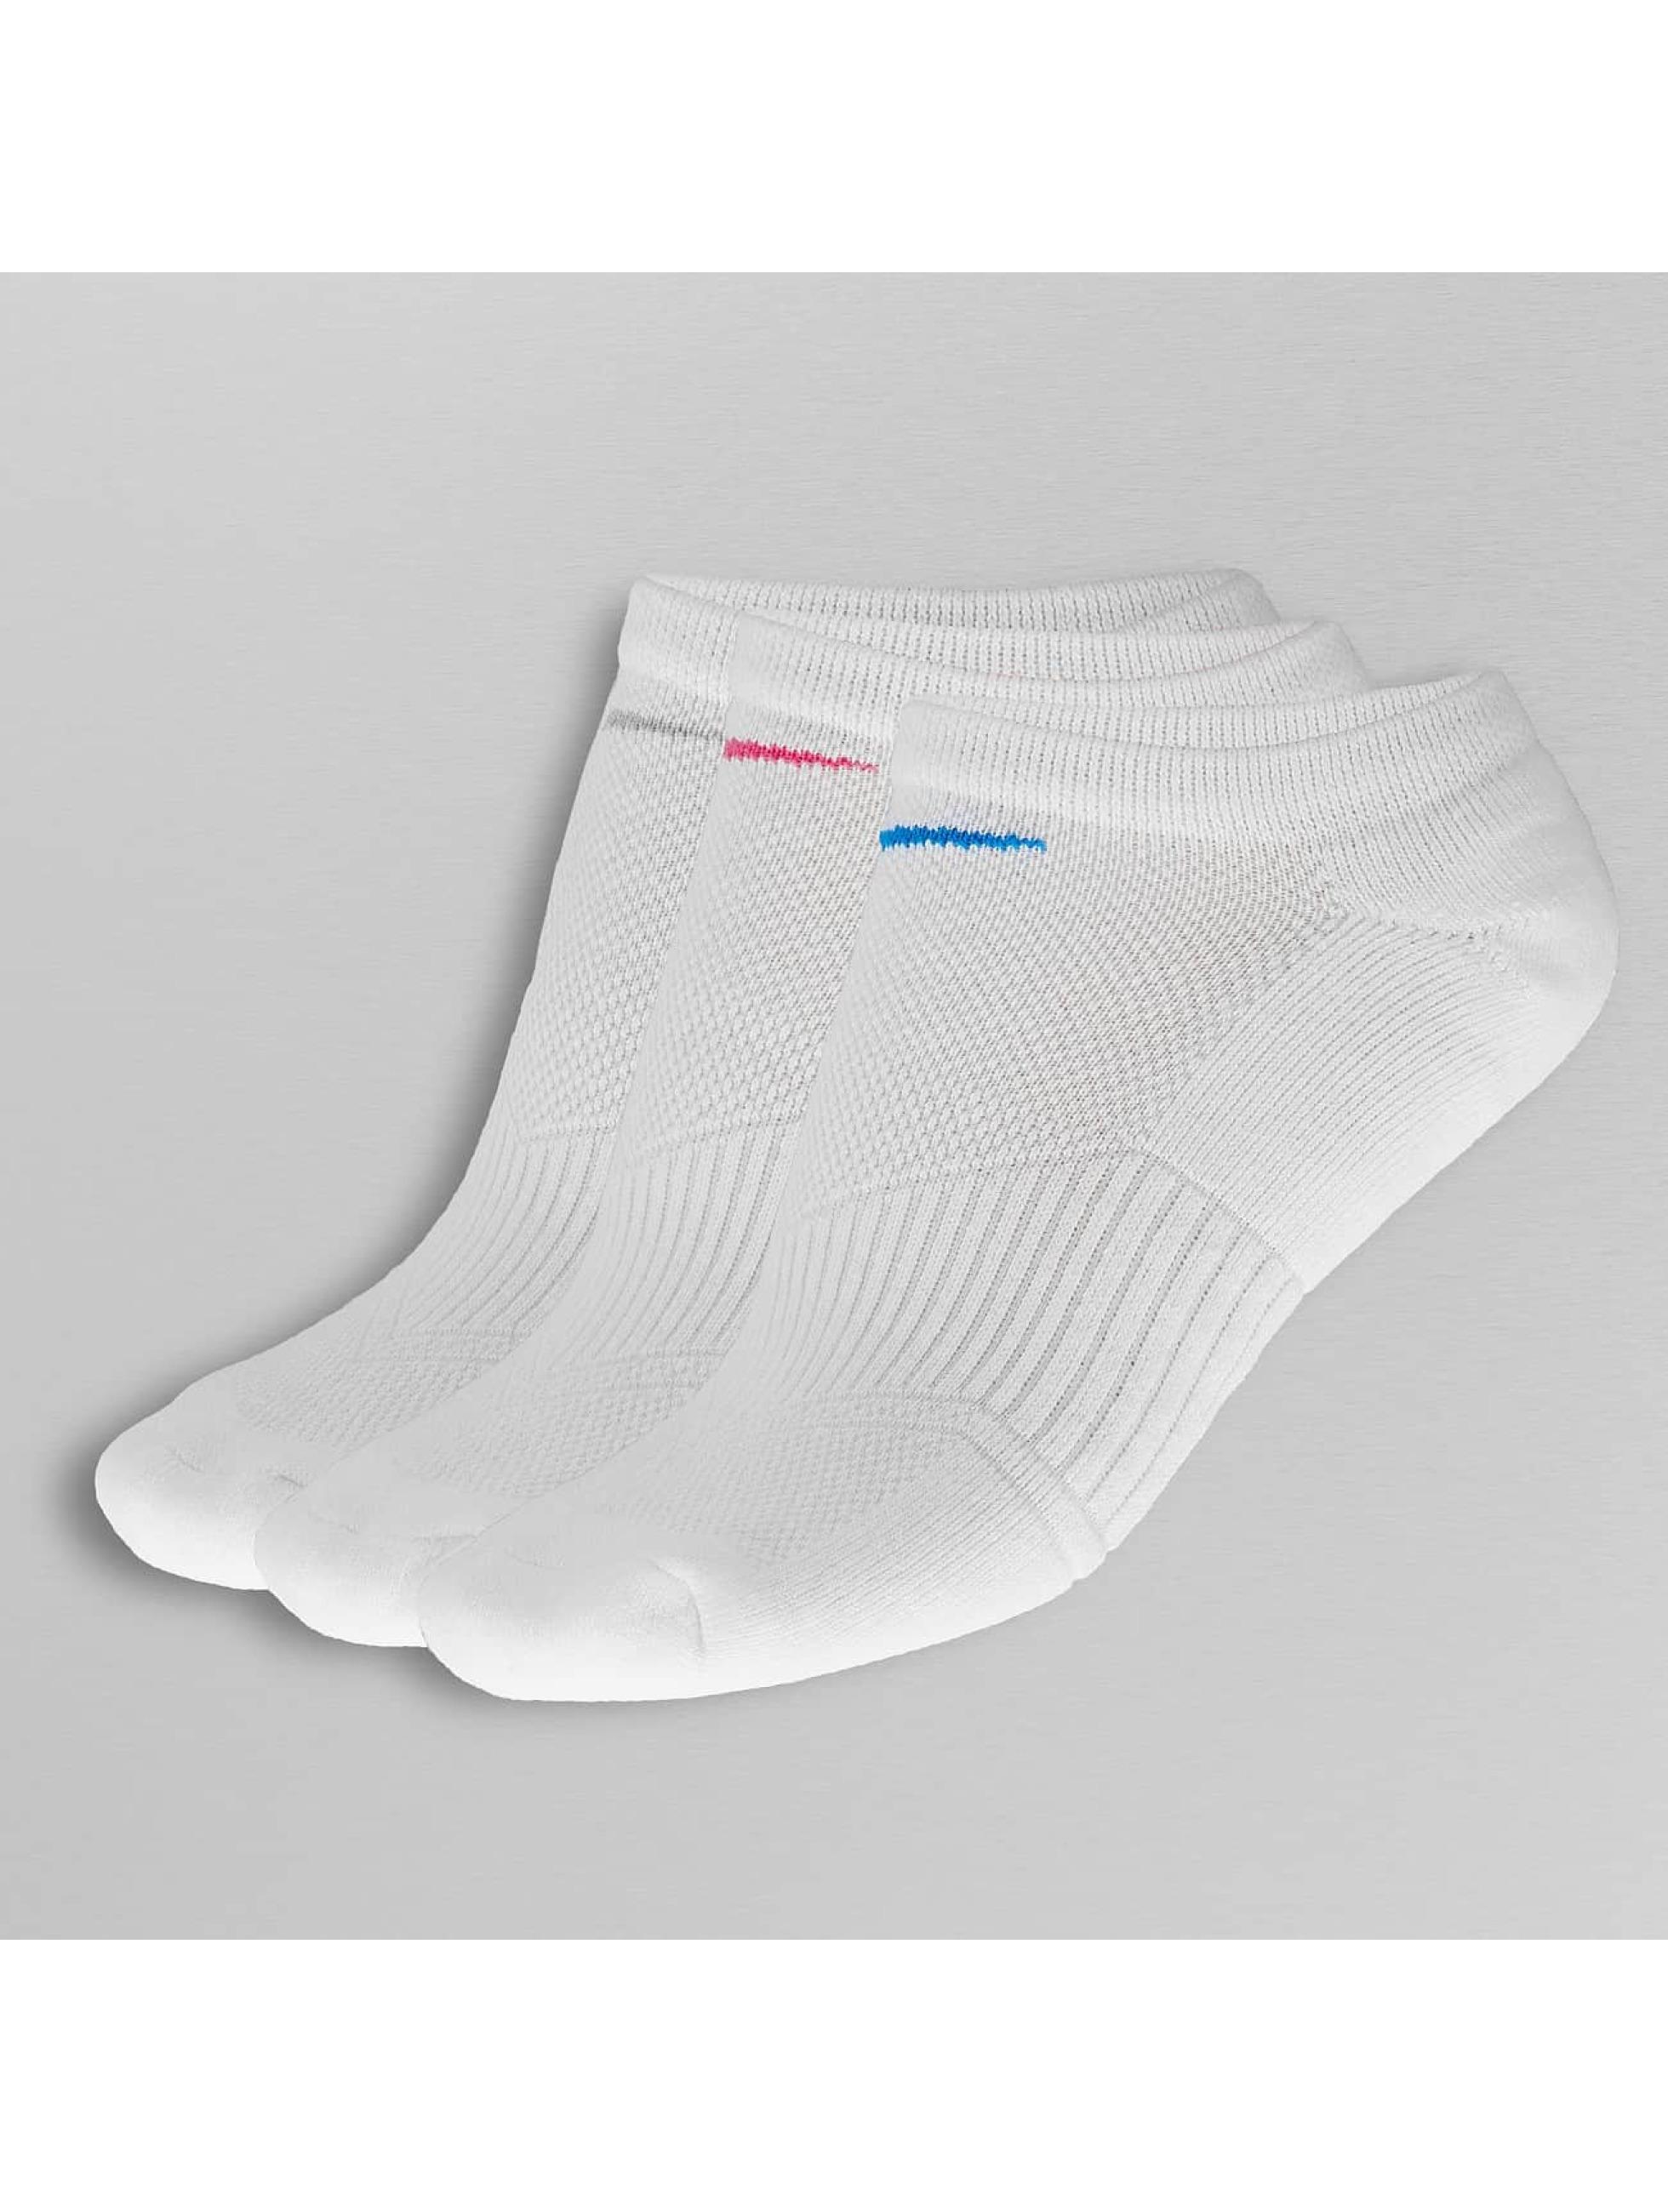 Nike Frauen Socken Cotton Cushion No Show in weiß